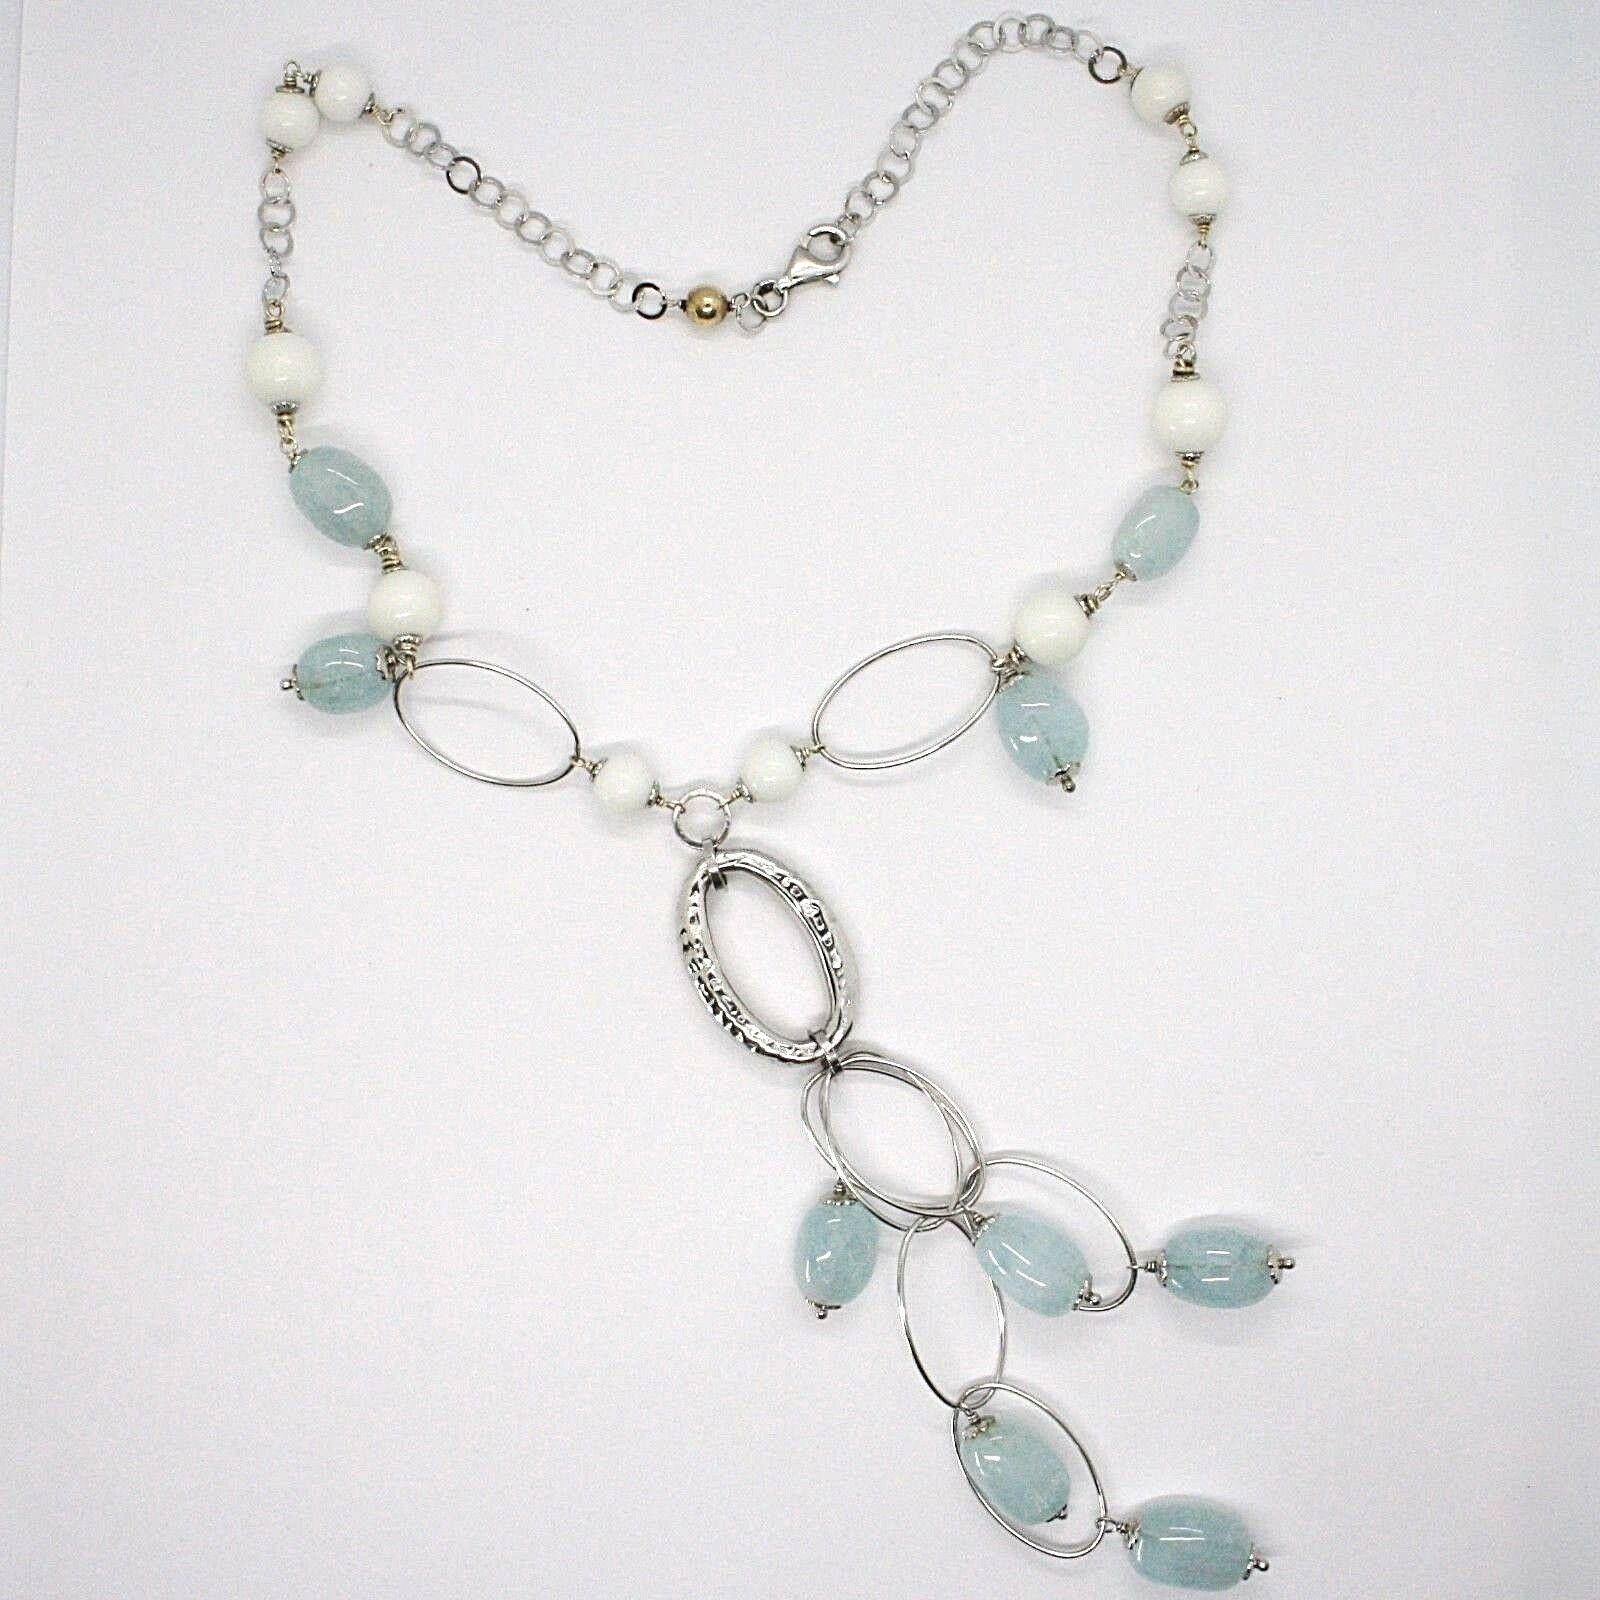 Necklace Silver 925, Spheres Agate White, Aquamarine Drop, Pendant, Ovals image 2